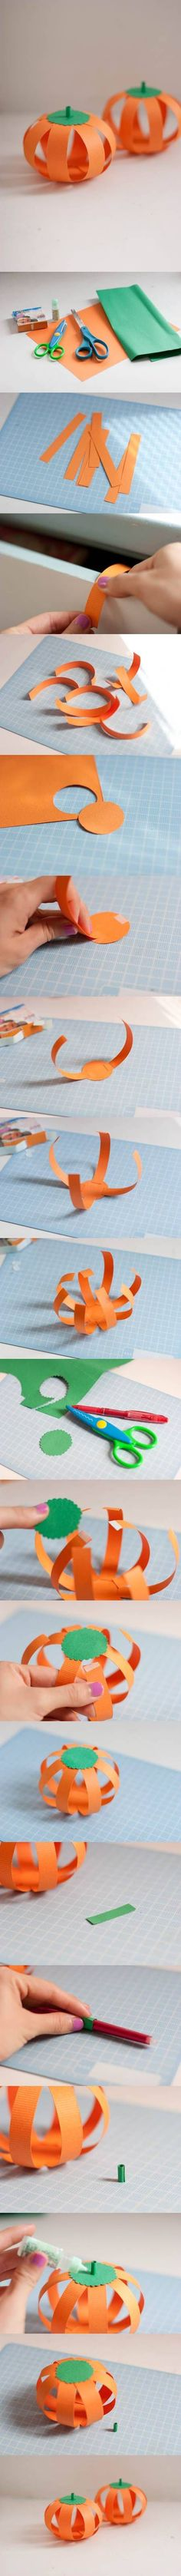 DIY Paper Halloween Pumpkin DIY Projects / UsefulDIY.com on imgfave